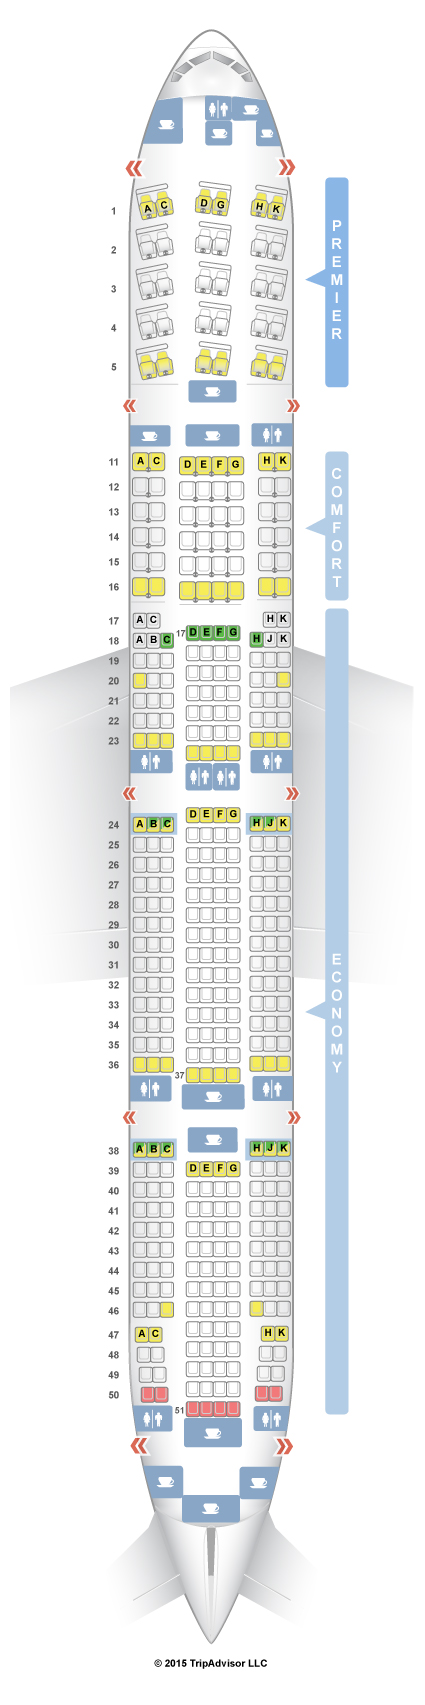 Seatguru Seat Map Aeroflot